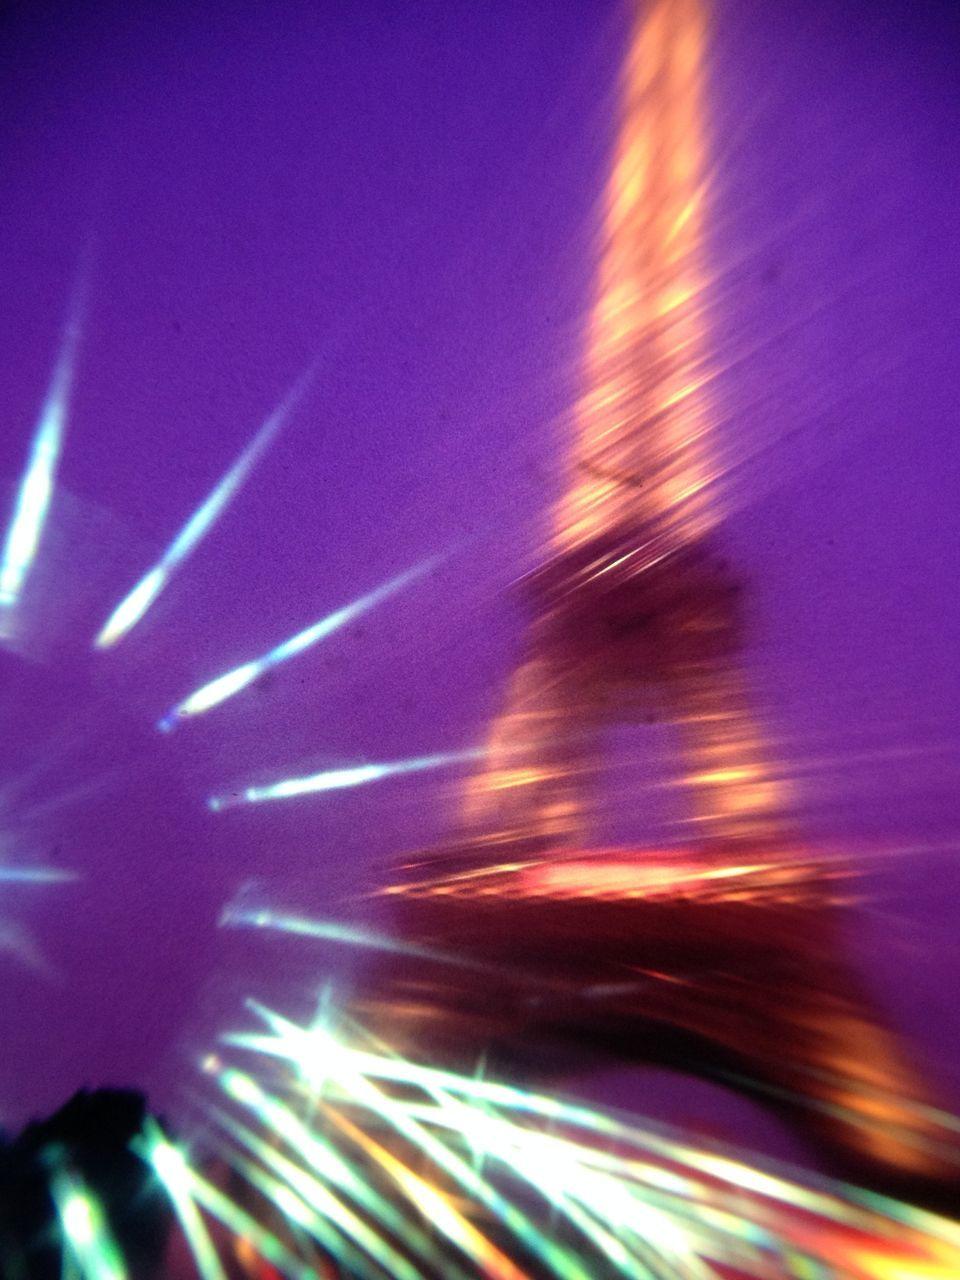 blurred motion, illuminated, night, motion, long exposure, speed, no people, indoors, defocused, sky